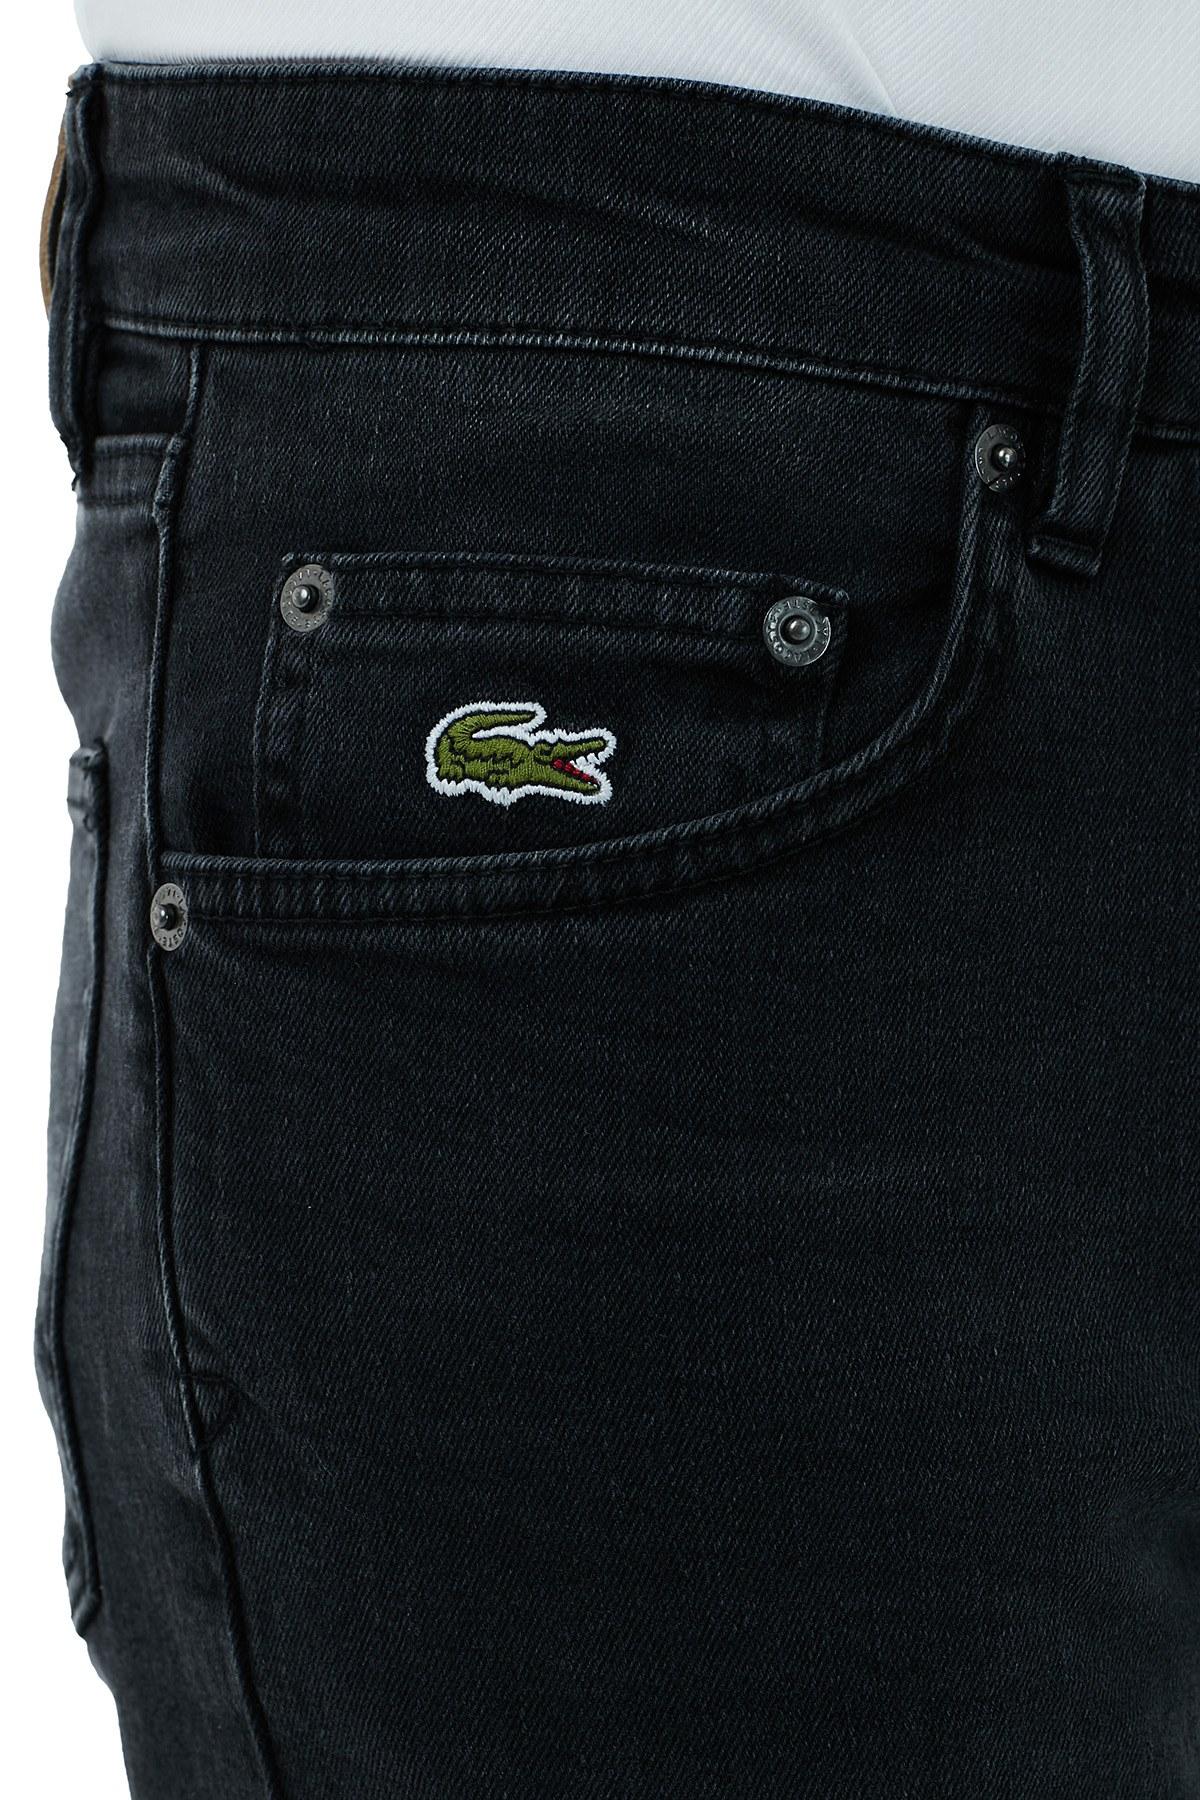 Lacoste Slim Fit Pamuklu Erkek Pantolon HH2054 54G GRİ